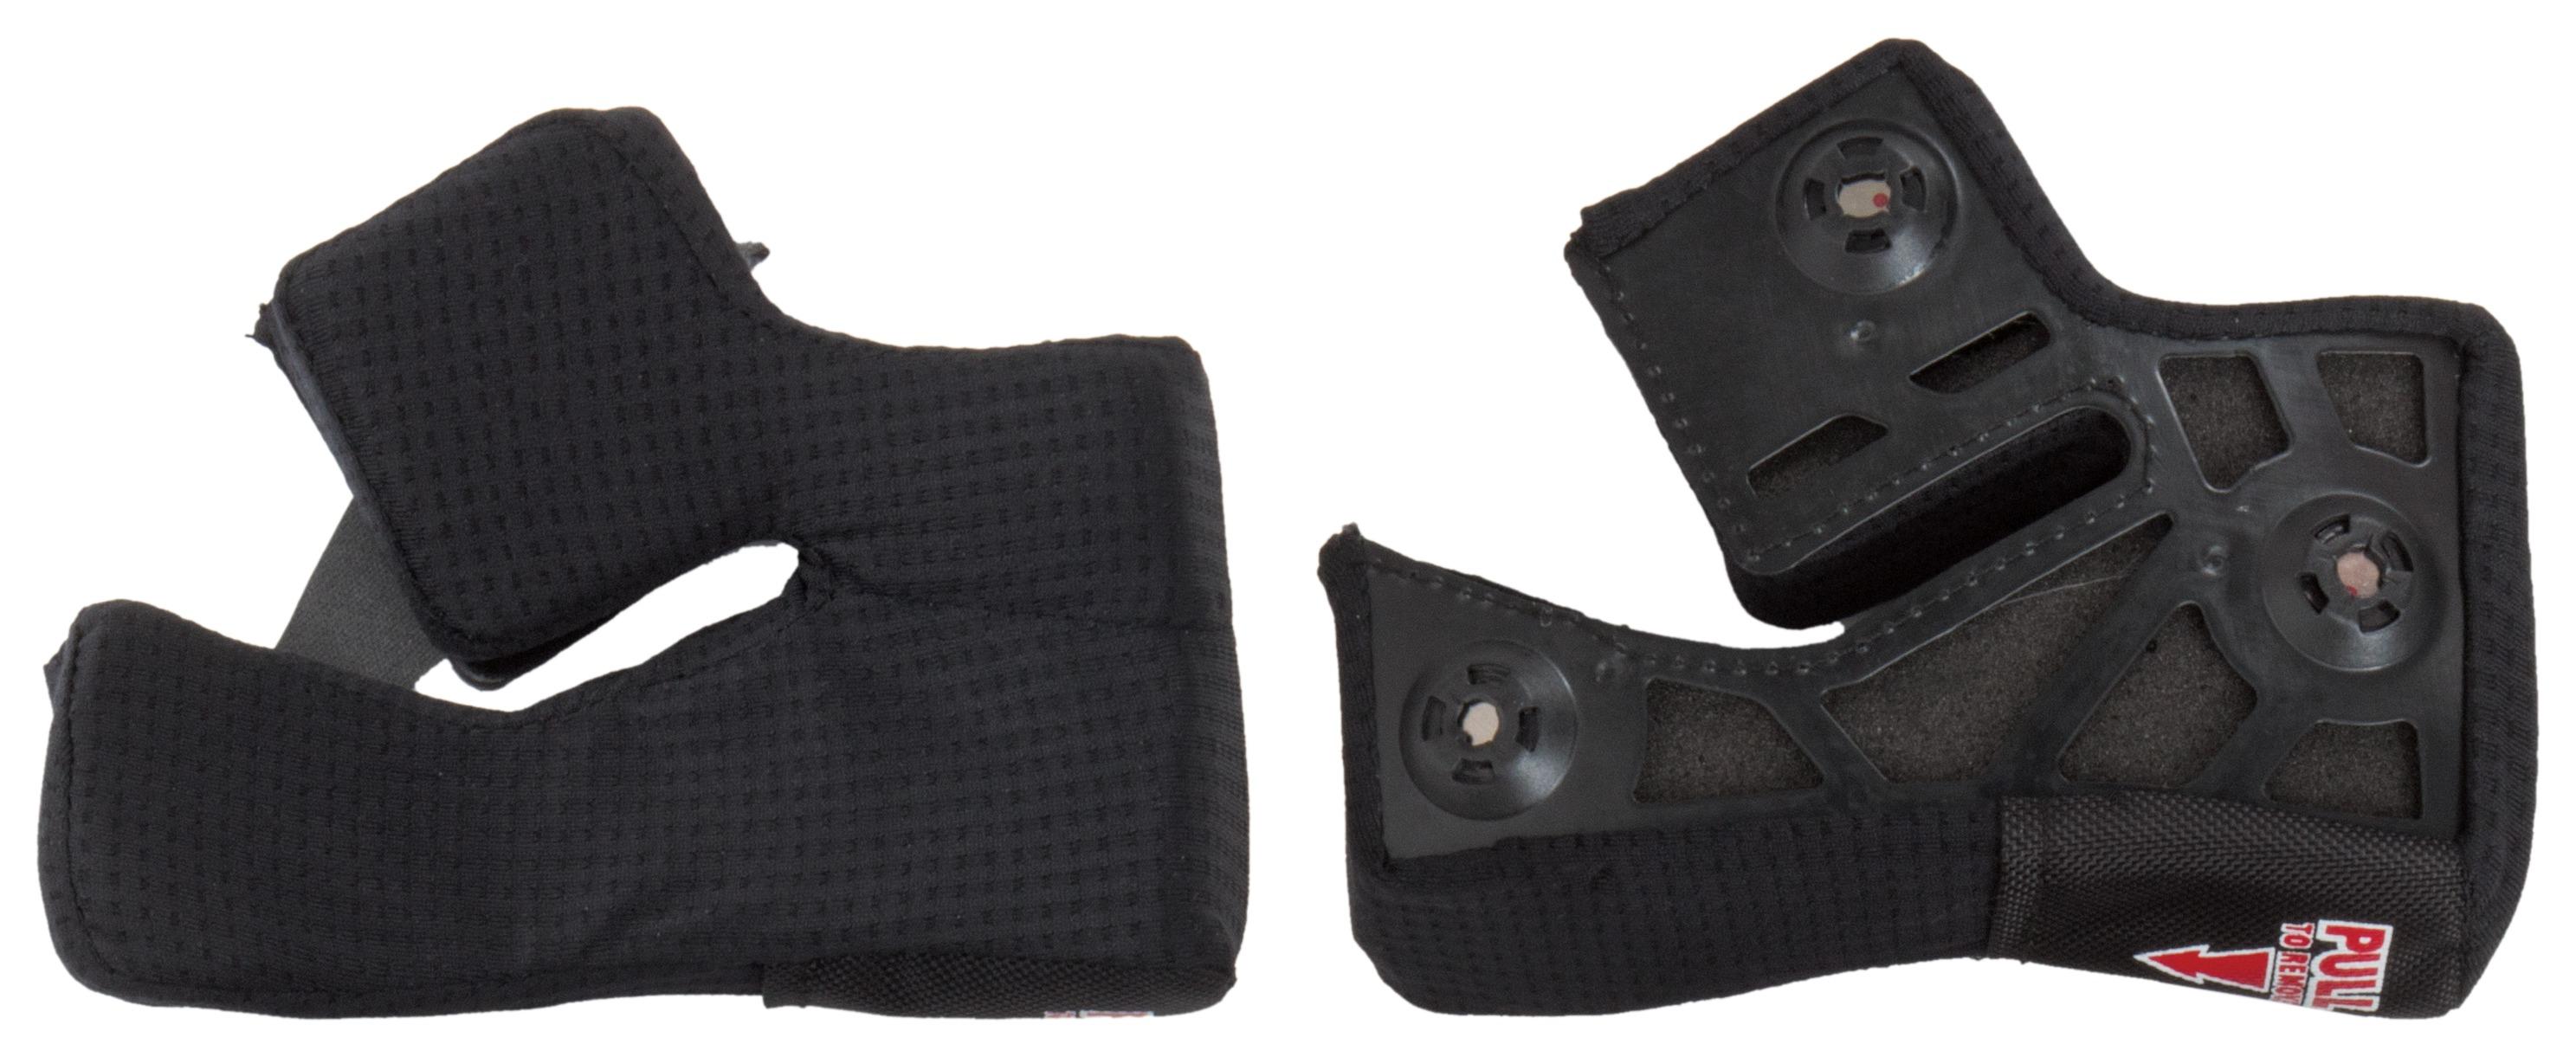 Bell Powersports Star Helmet Replacement X-Static Cheek Pads Radsport 25 mm